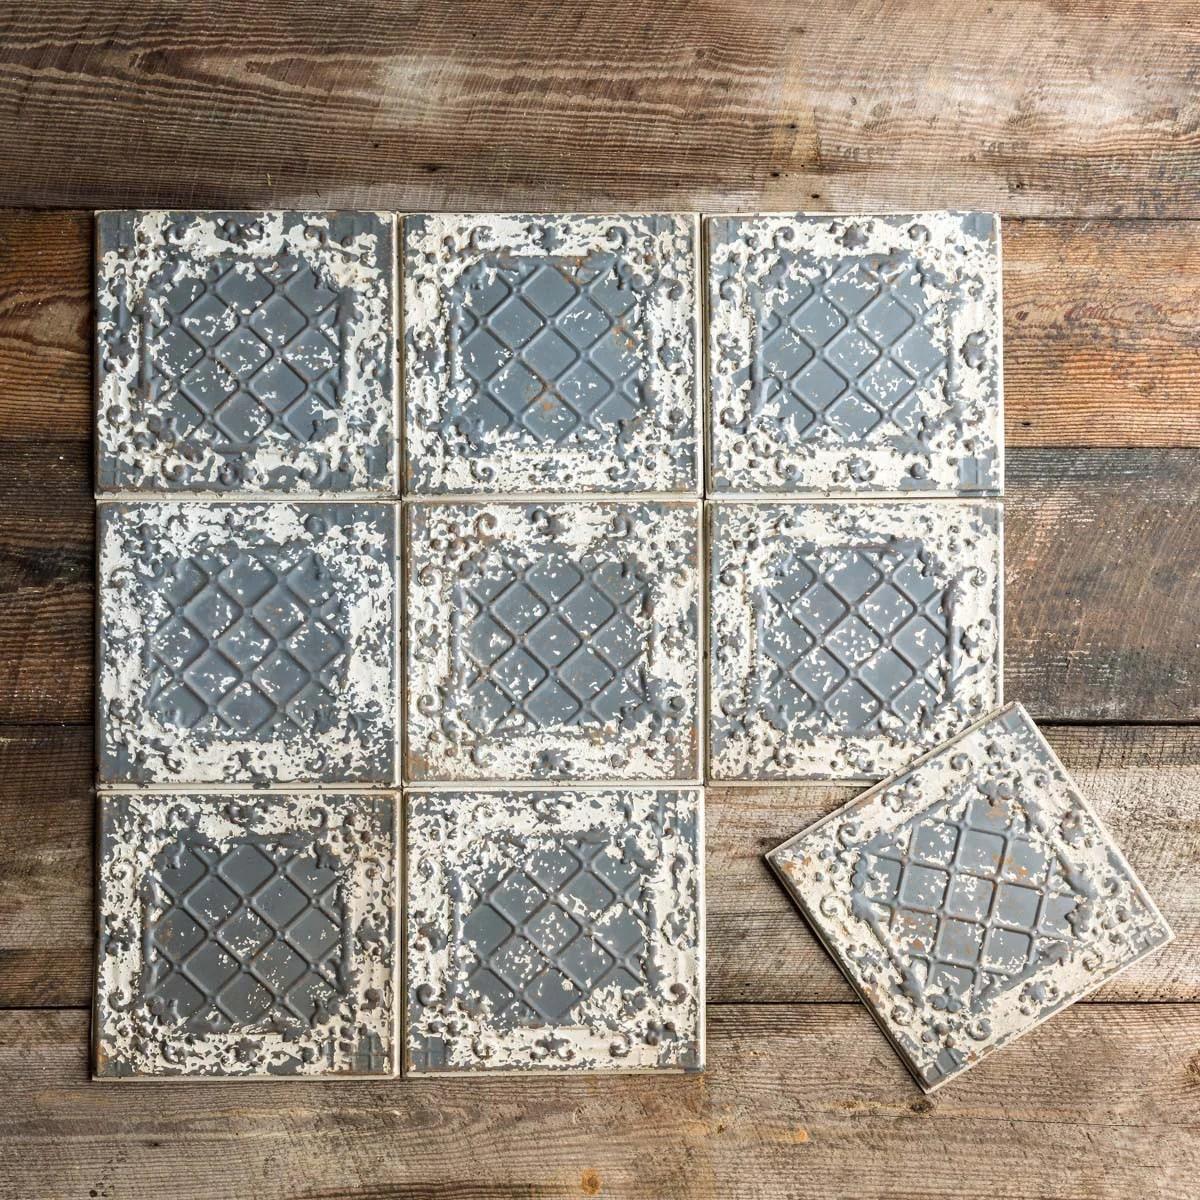 lovecup antique white tin ceiling tile set of 16 l923